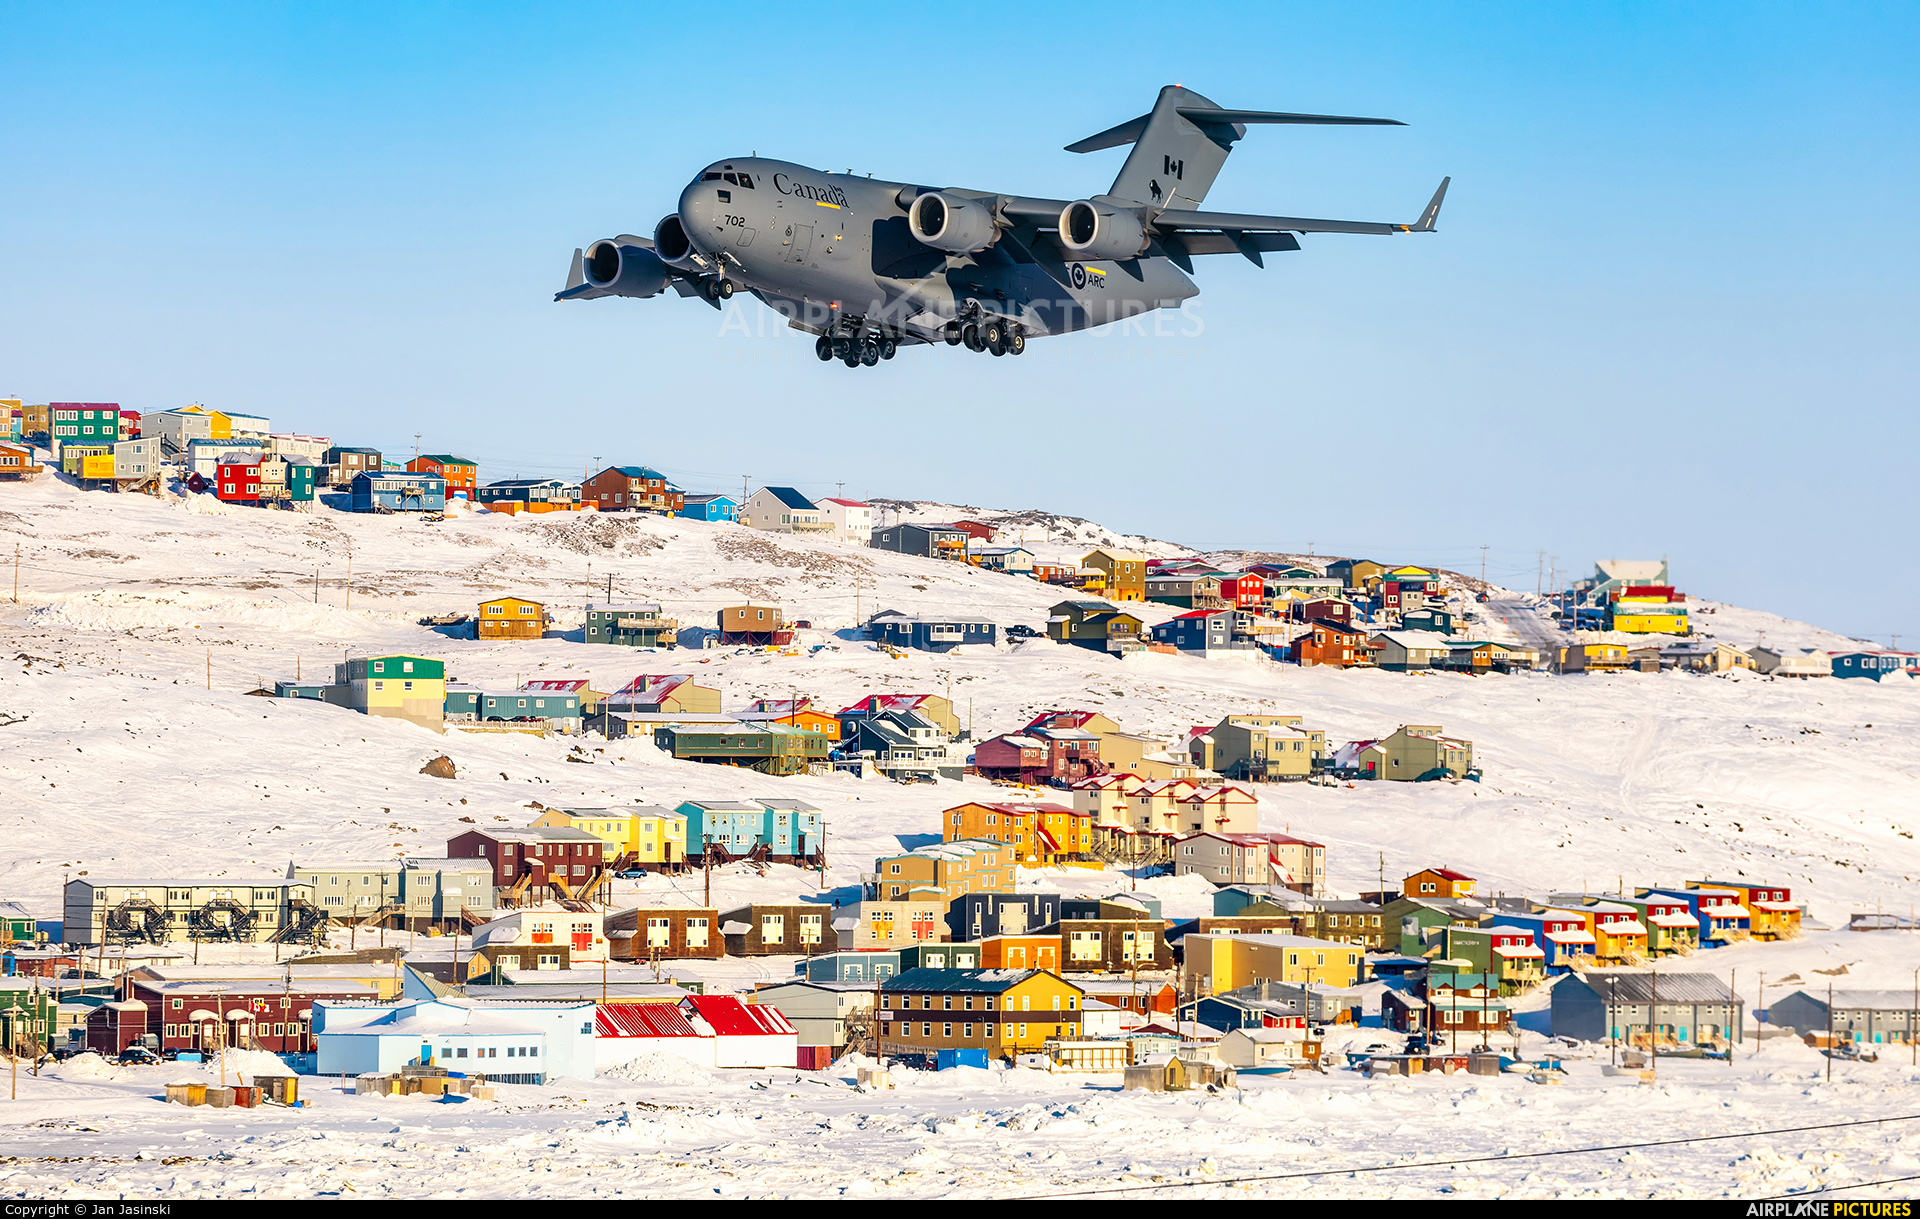 Canada - Air Force 177702 aircraft at Iqaluit